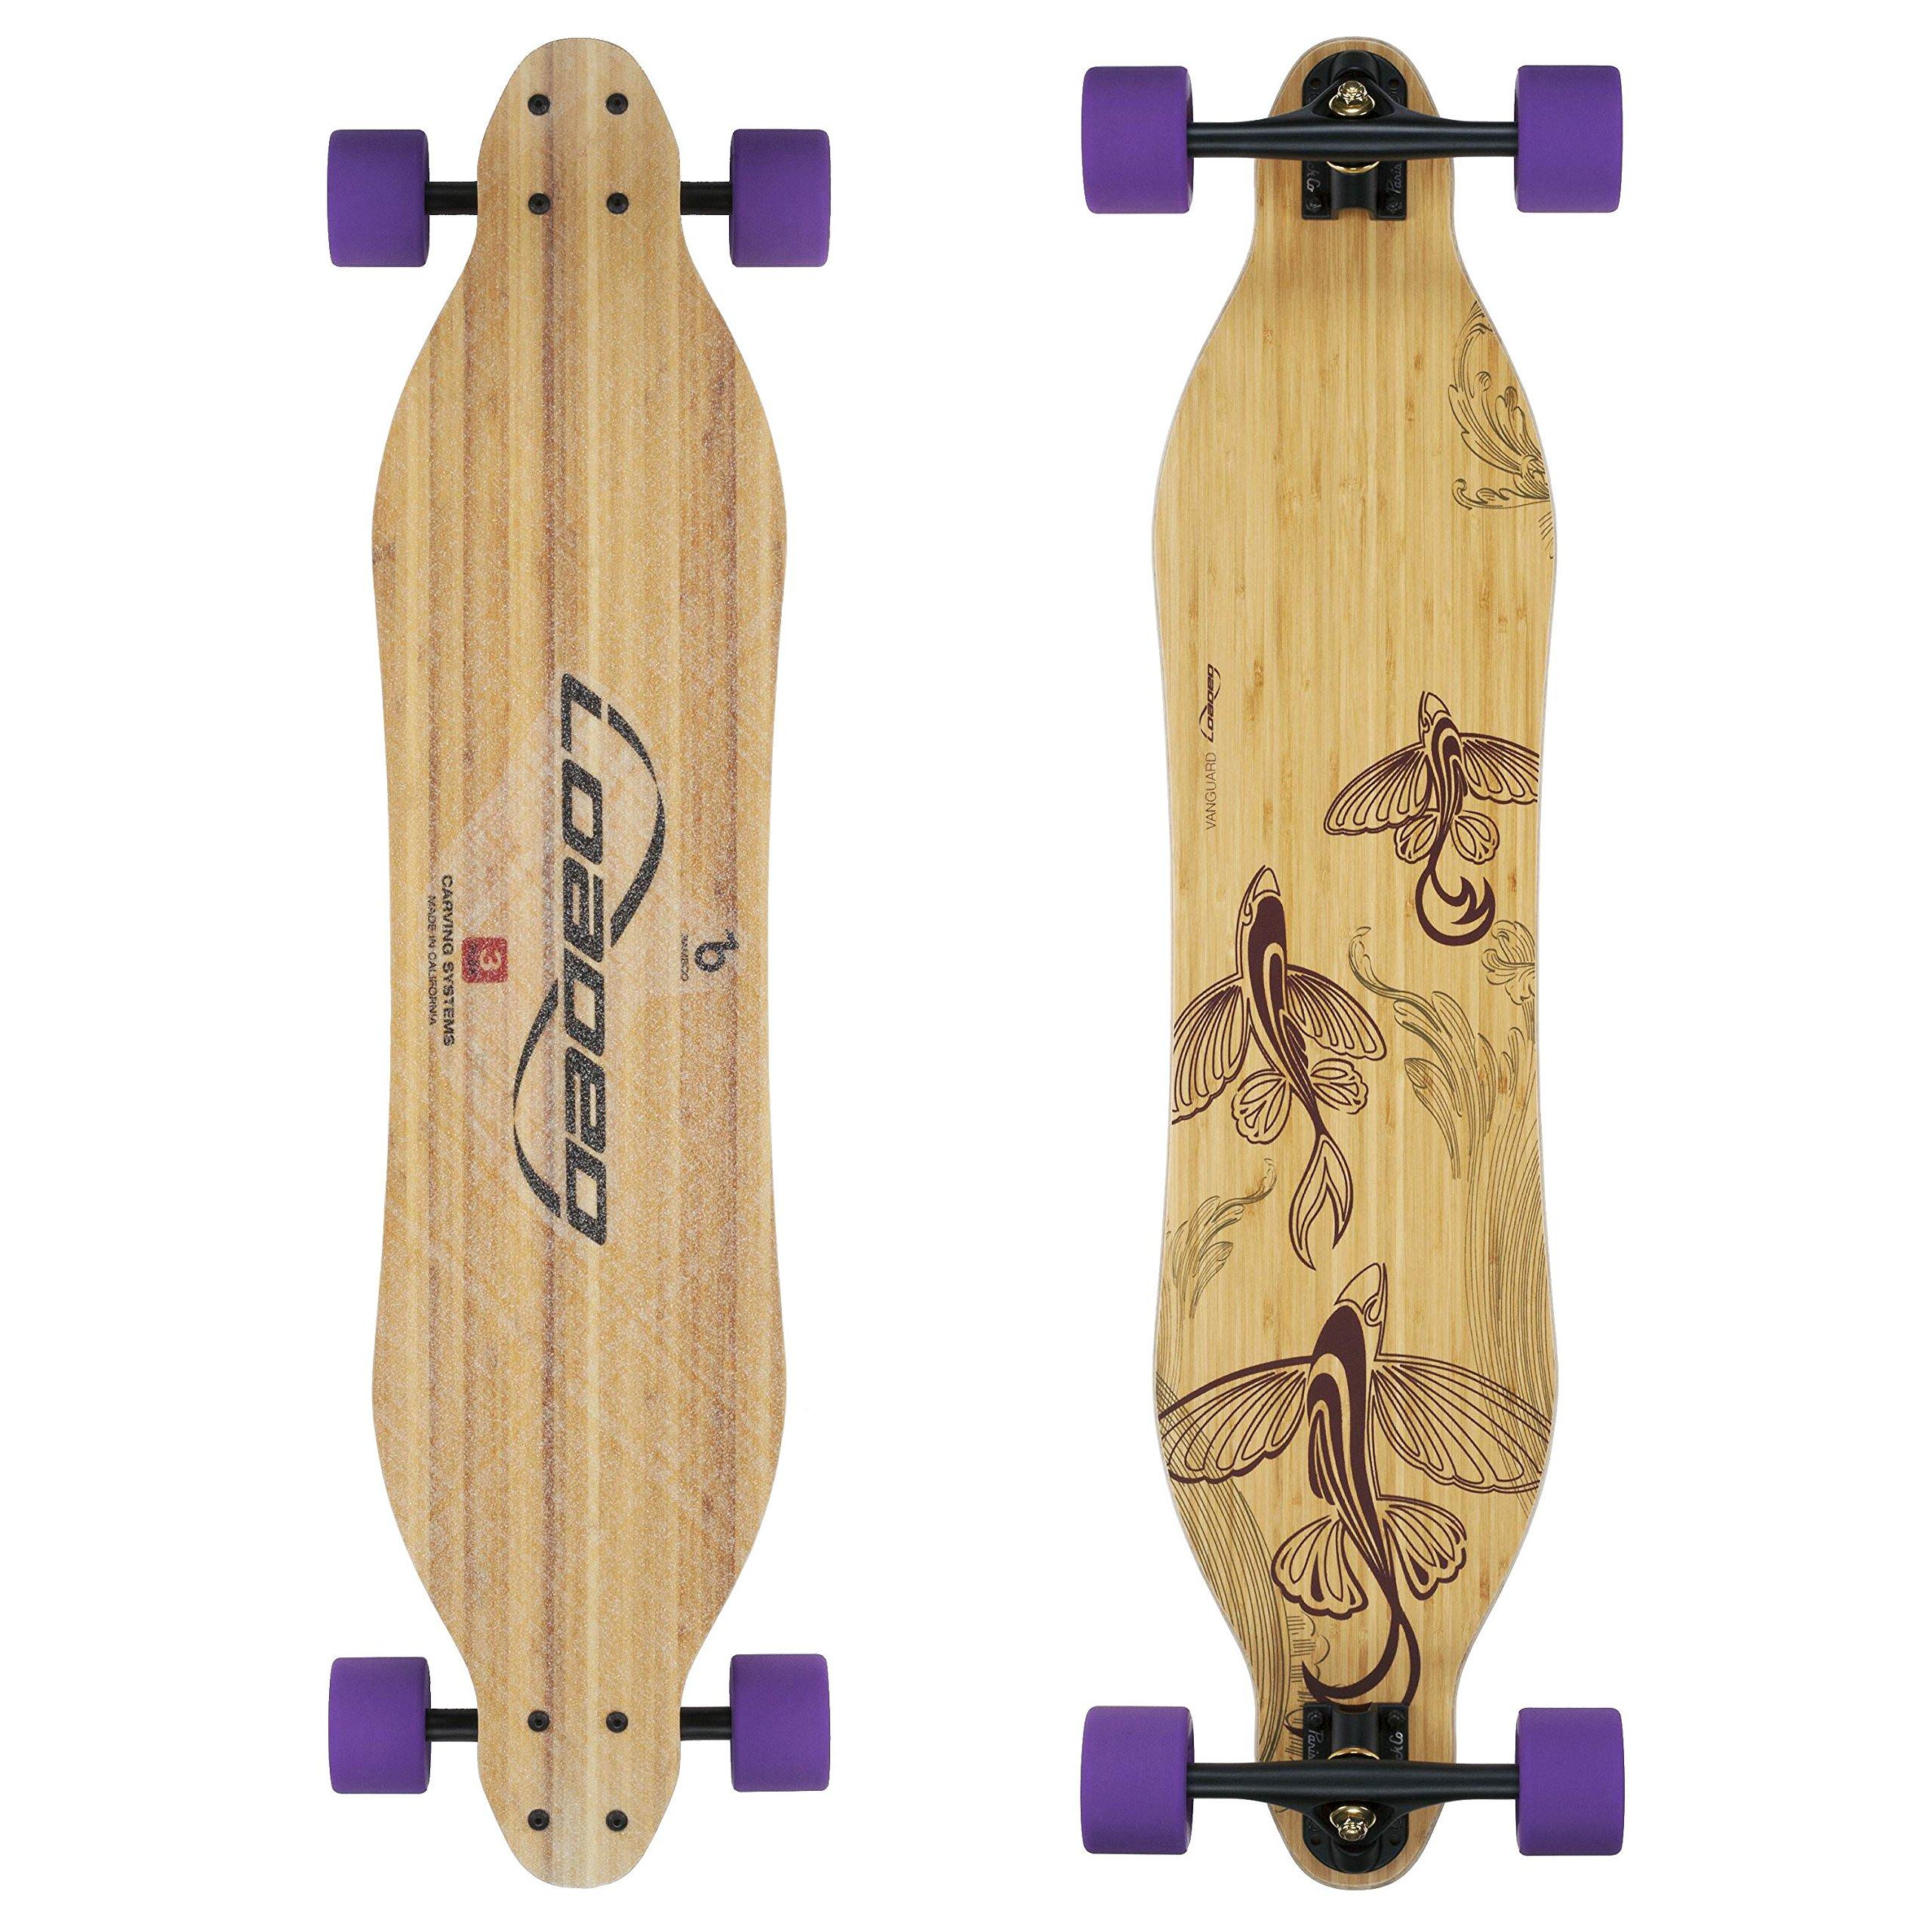 Loaded Boards Vanguard Bamboo Longboard Skateboard Complete (83a Durian, Flex 3)